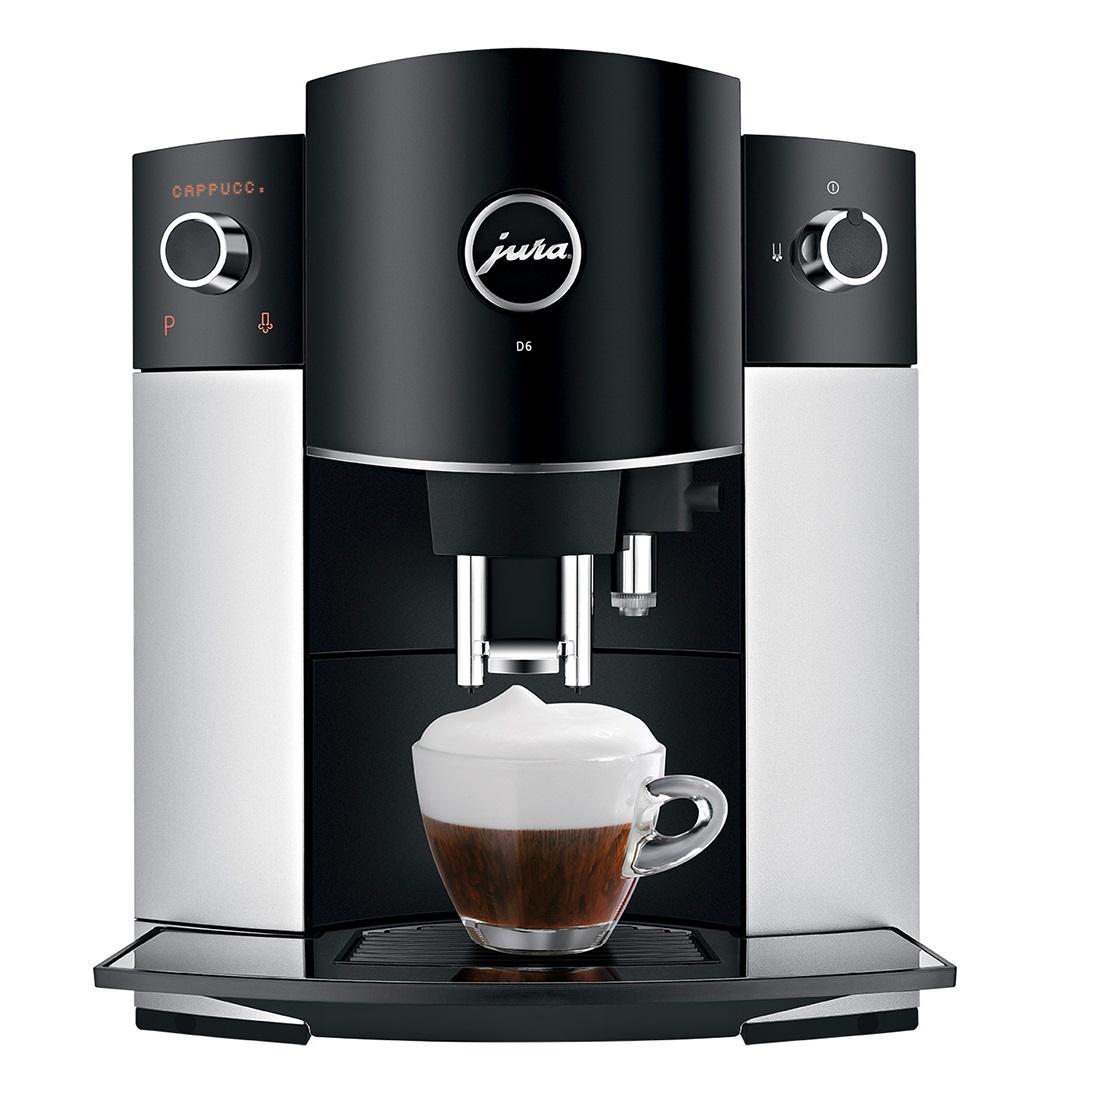 Espressor automat Jura D6, 15 bari, 1.9 l, 200g, rasnita AromaG2, afisaj cu text, Platinum+ cafea cadou